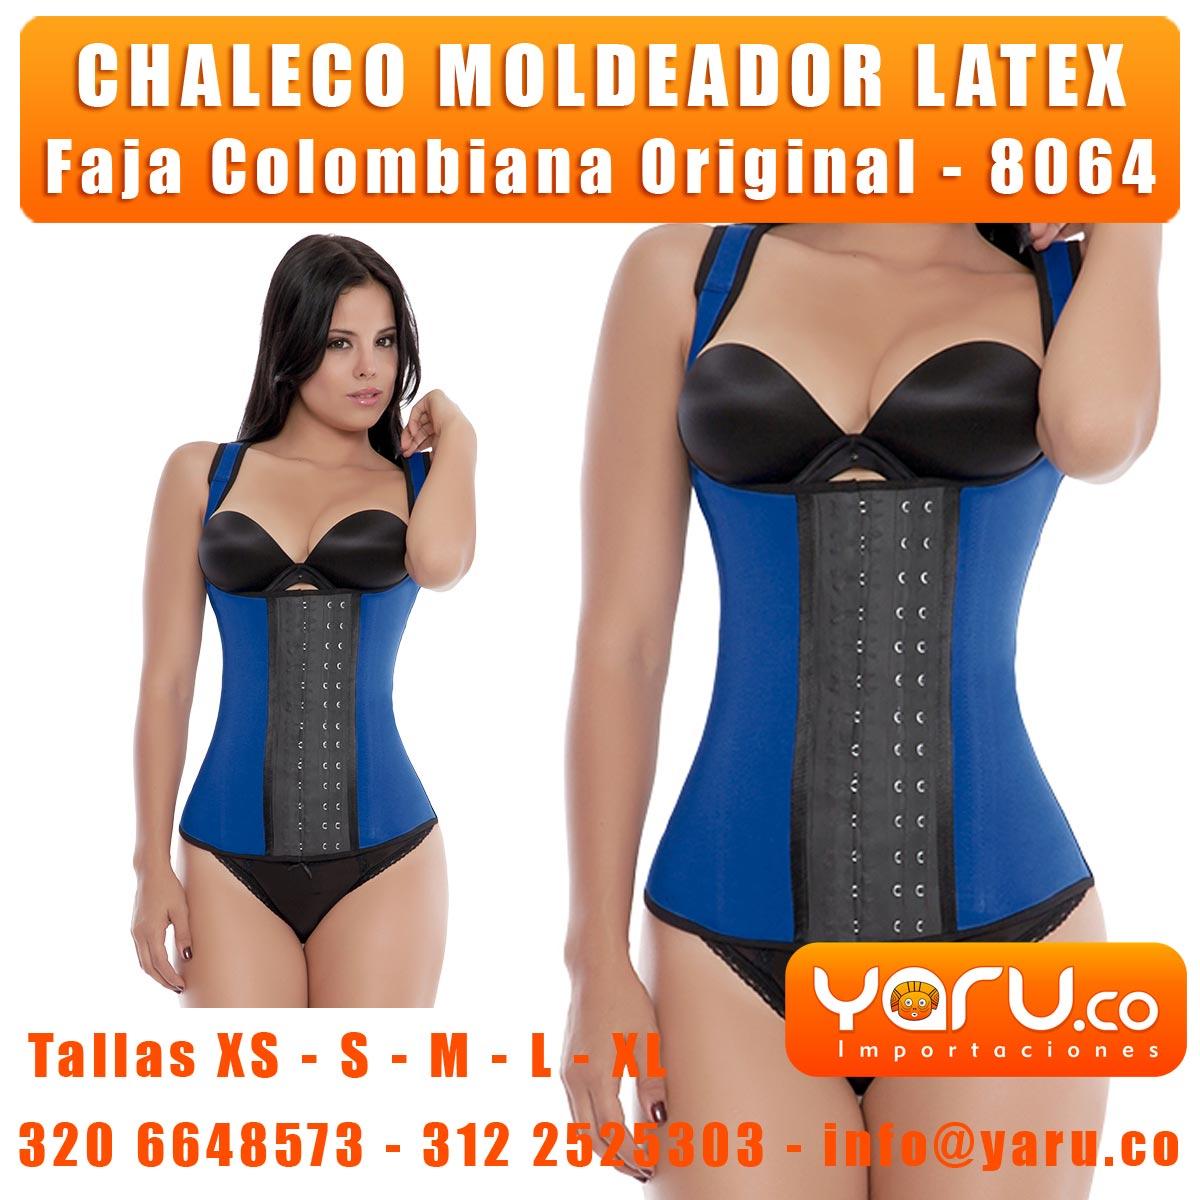 Chaleco Moldeador Latex. Yaru Fabrica de Fajas Colombianas ... 6be4708a7e5b6